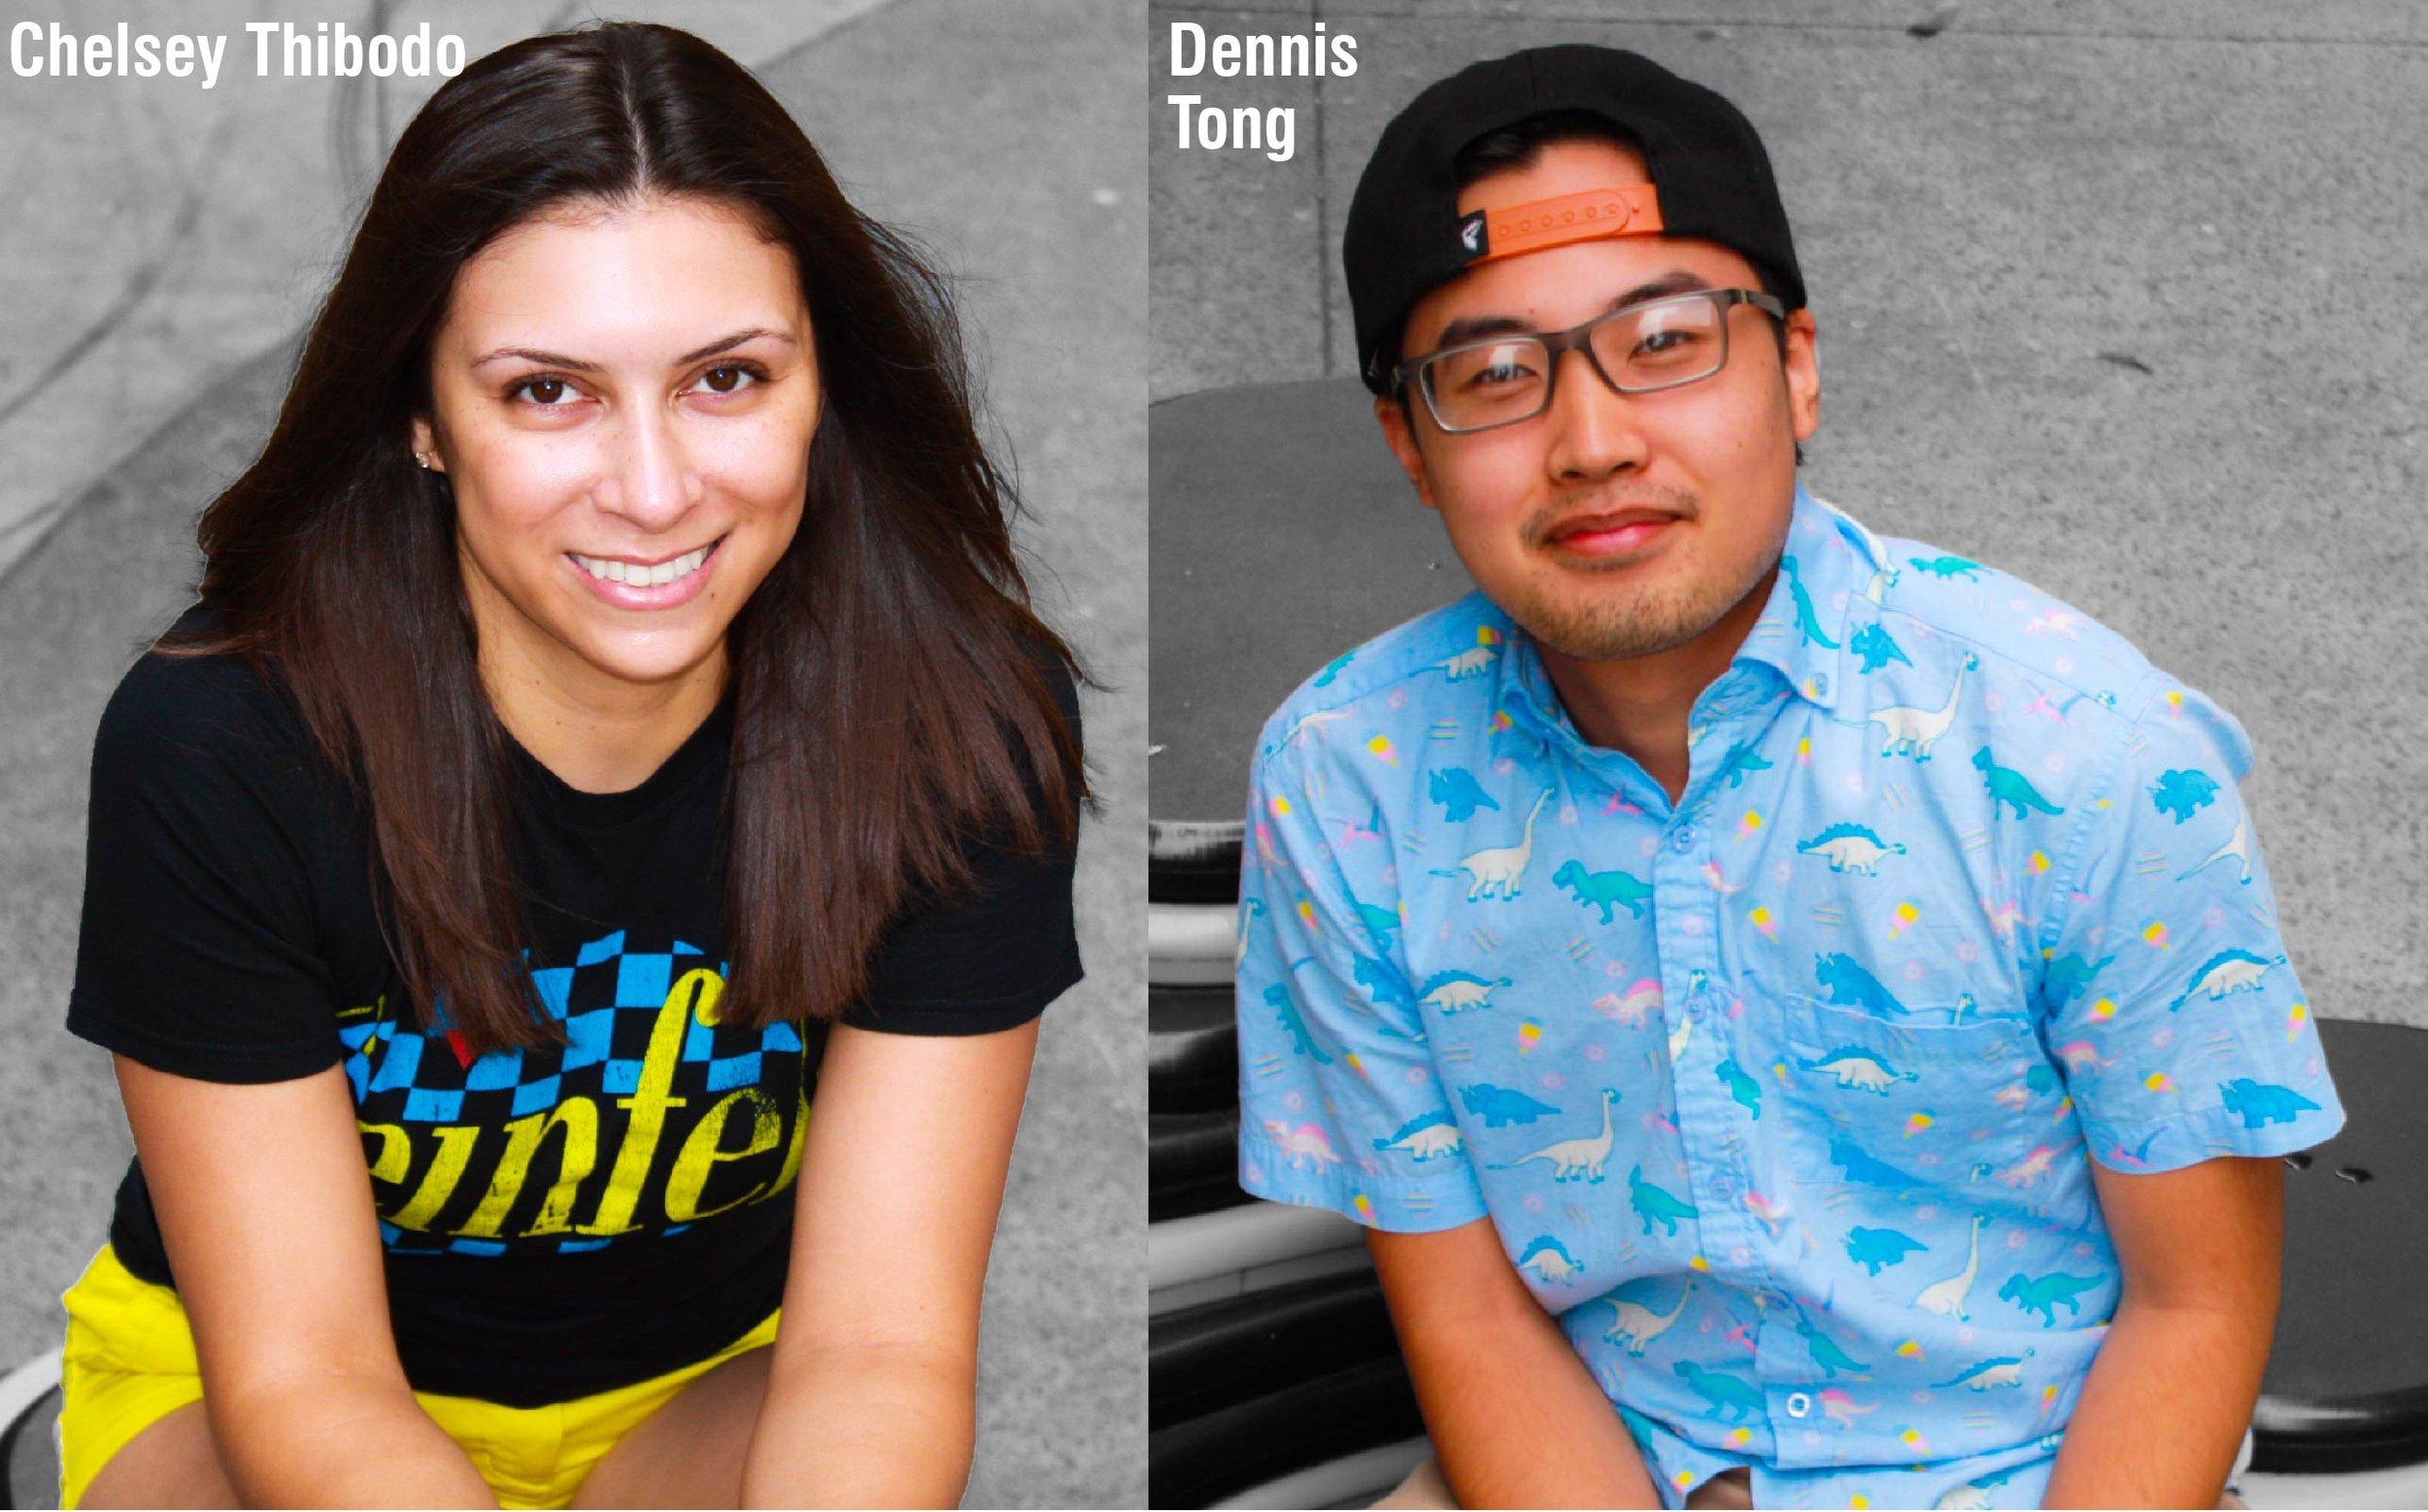 Chelsey and Dennis.jpg